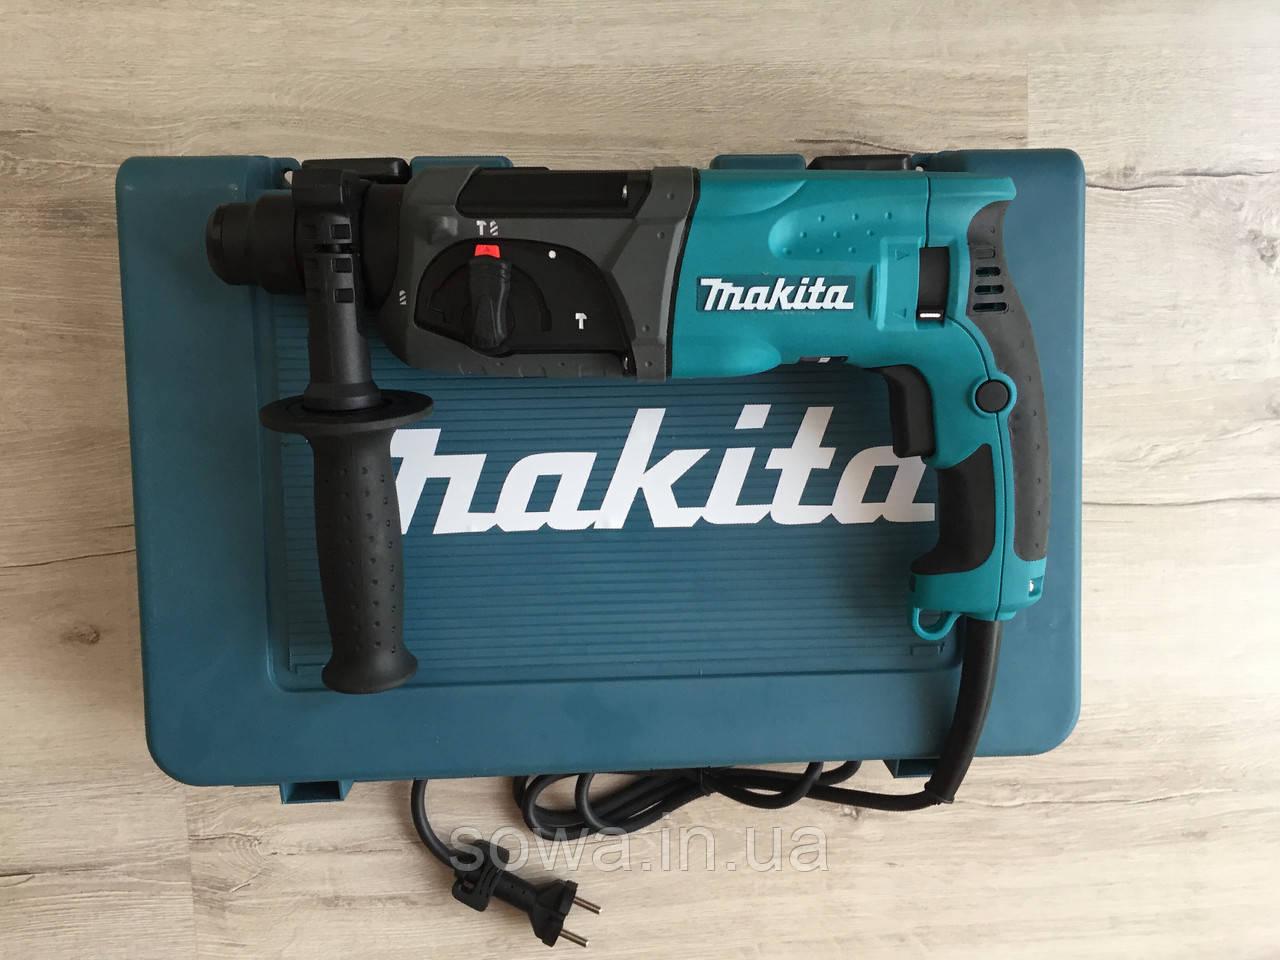 ✔️ Прямой перфоратор Макита_Makita HR 2470 / 780 Вт /